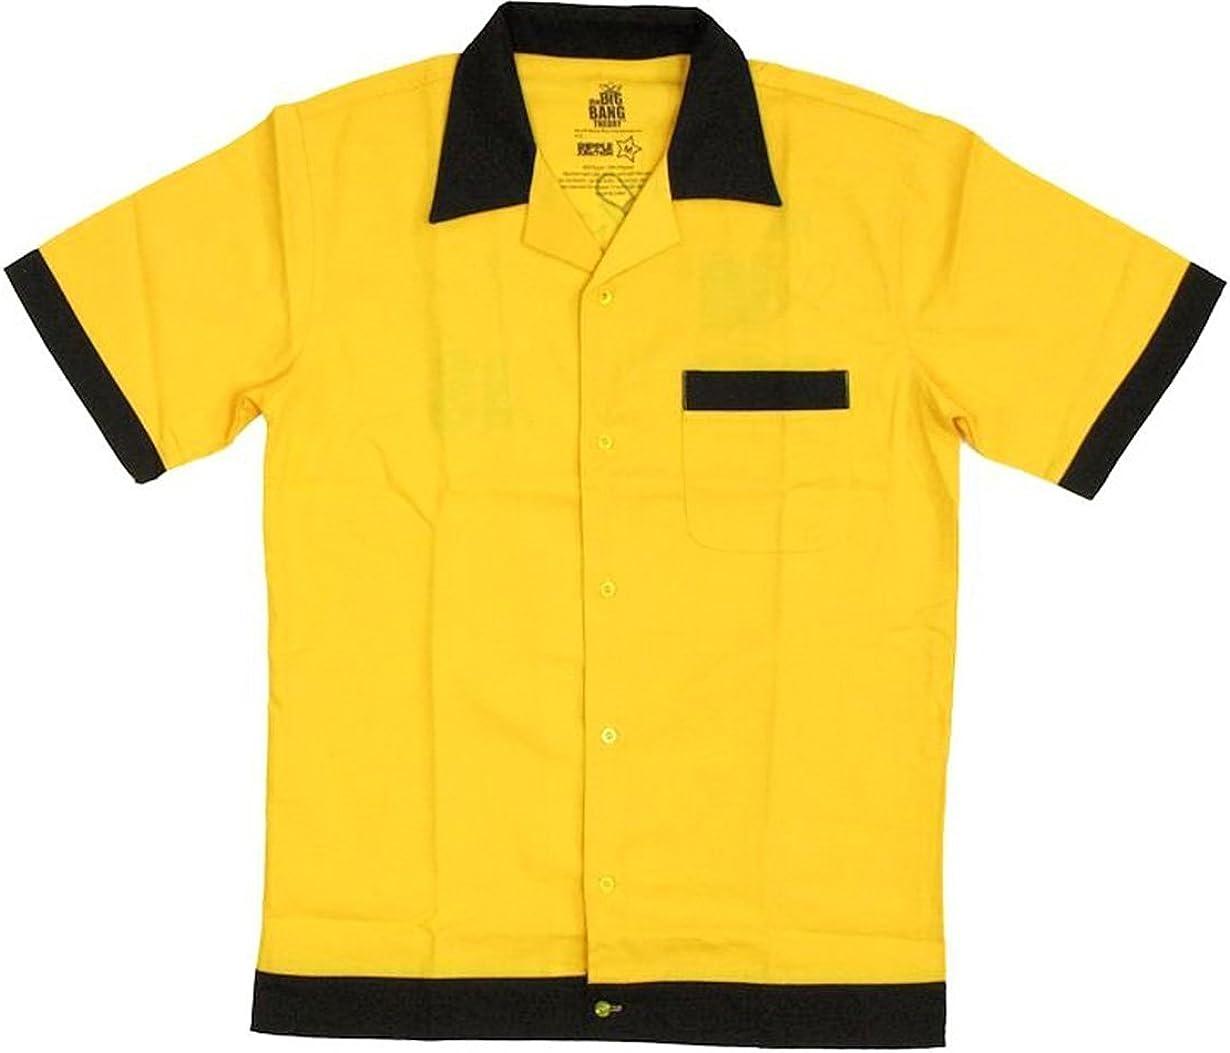 Ripple Junction Big Bang Theory Wesley Crushers Bowling Adult T-Shirt